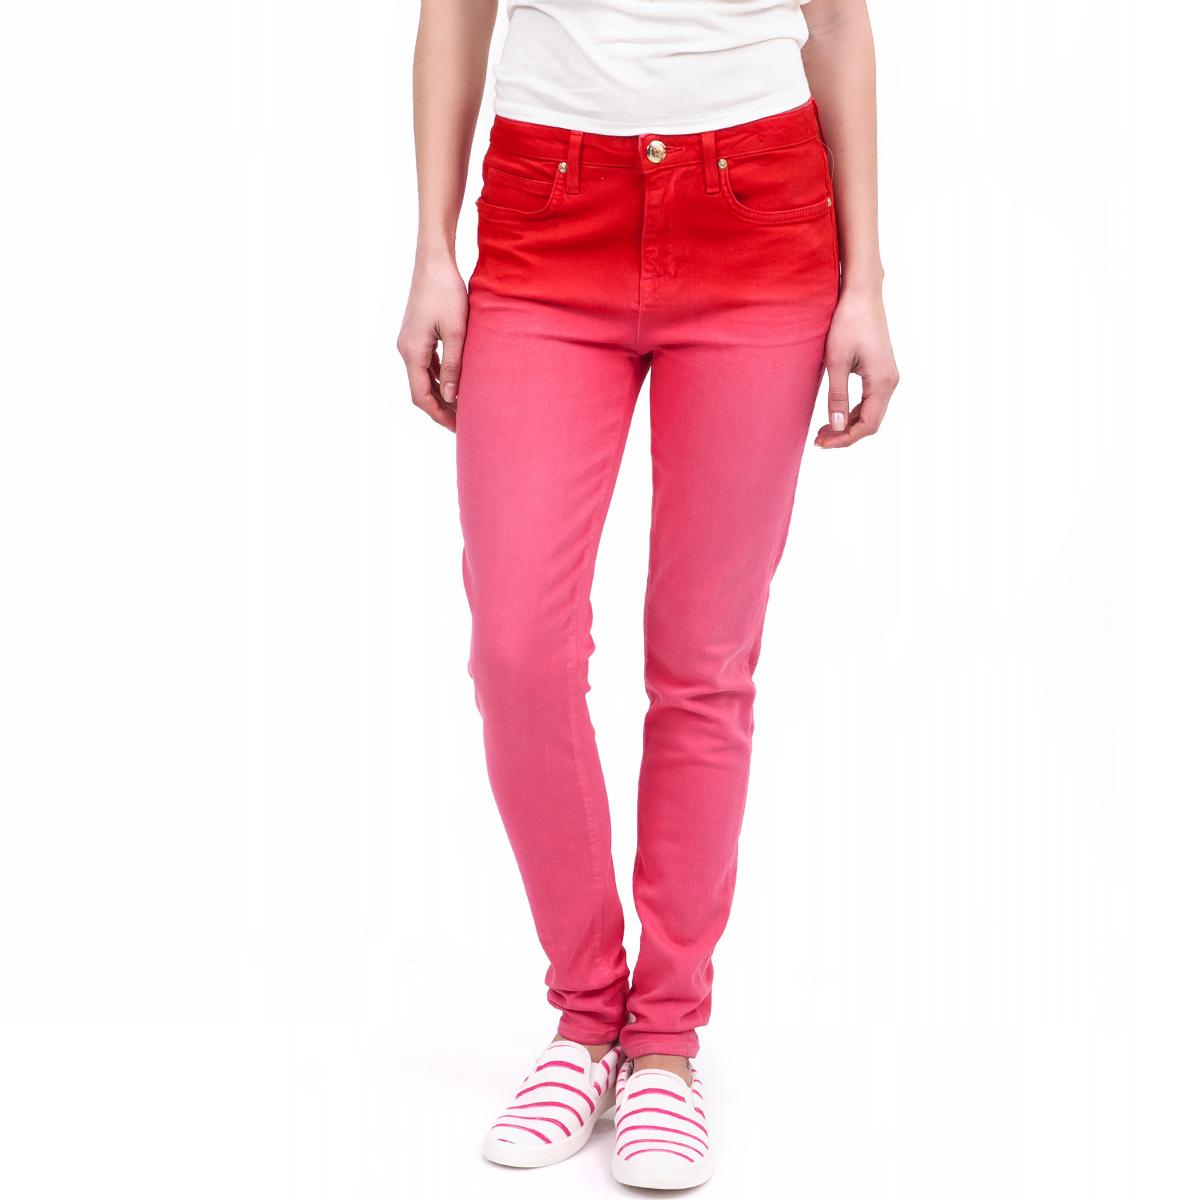 JUICY COUTURE - Γυναικείο παντελόνι Juicy Couture κόκκινο γυναικεία ρούχα παντελόνια skinny